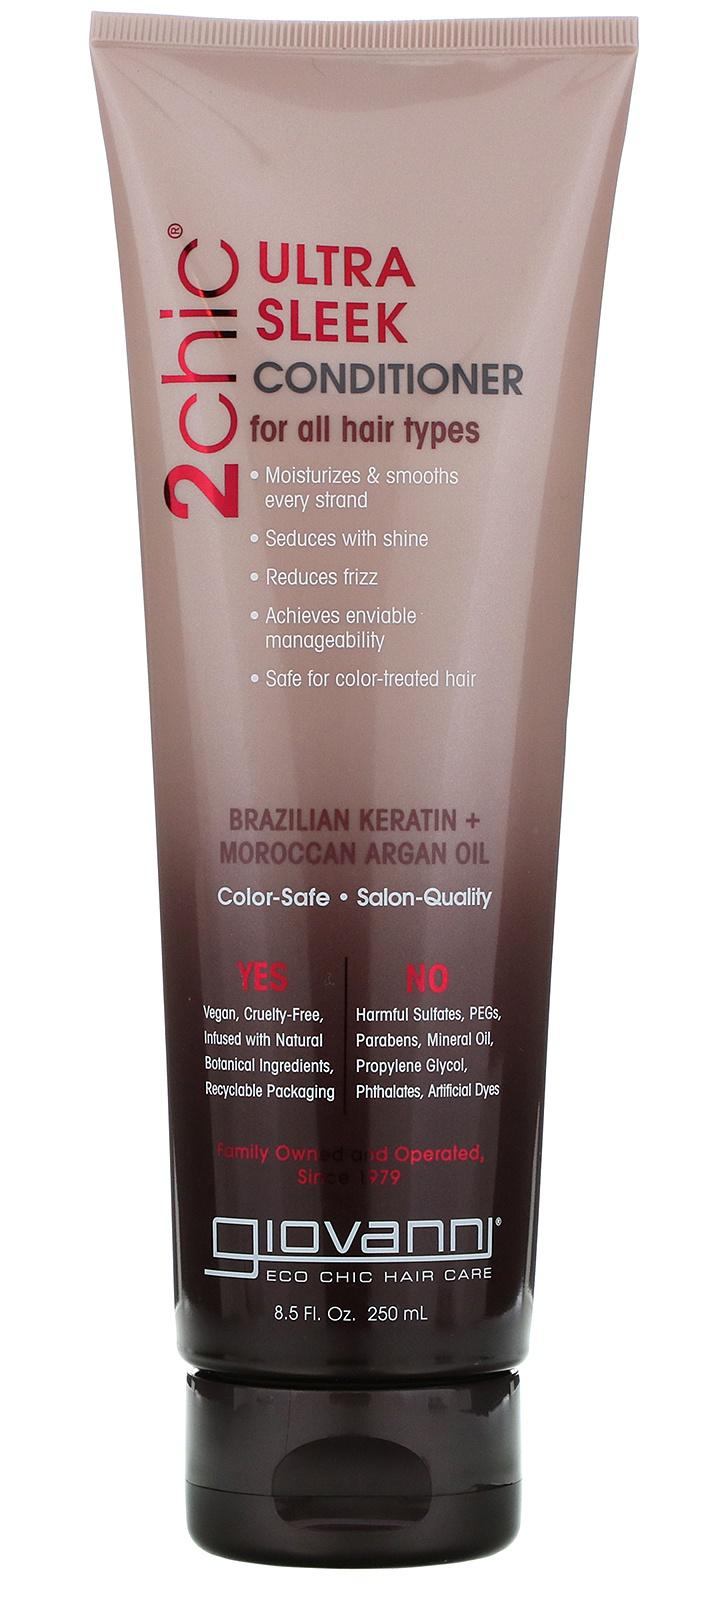 Giovanni 2Chic, Ultra-Sleek Shampoo, Brazilian Keratin & Argan Oil